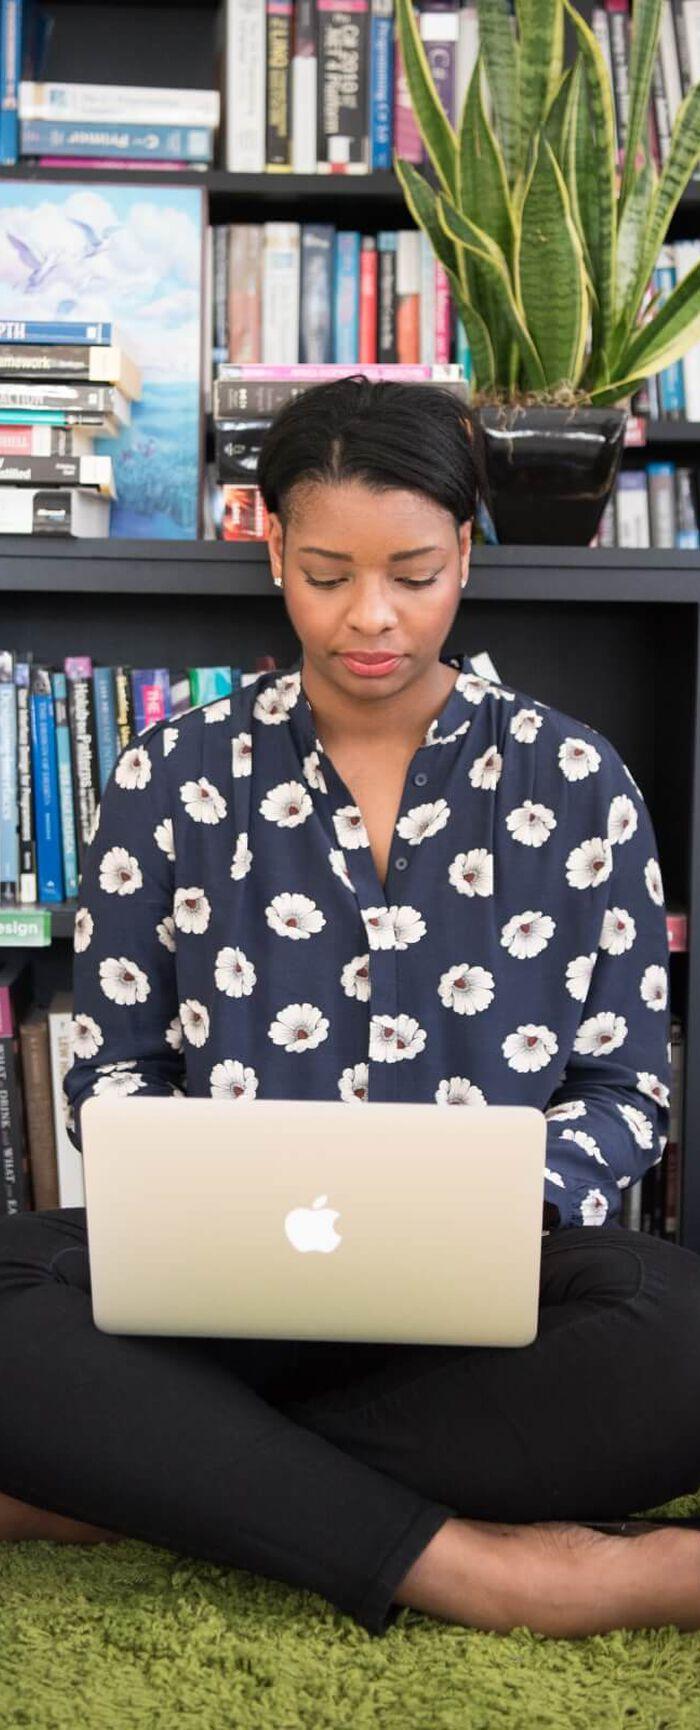 Smiling Woman Working on Laptop Drinking Beverage